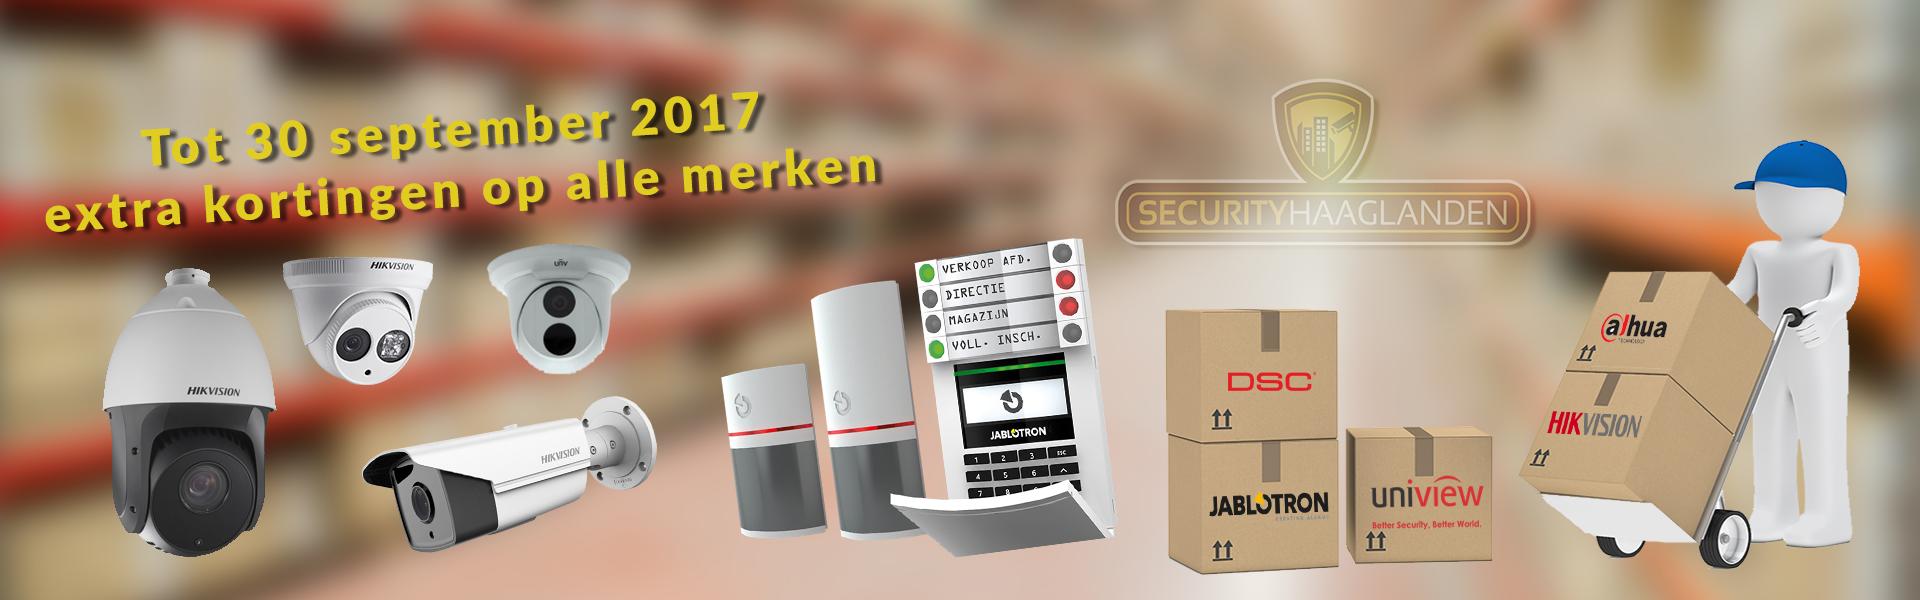 Opruiming Hoge Kortingen Hikvision Dahua Jablotron 100 DSC viscoo uniview alarmsteem full hd camerasysteem